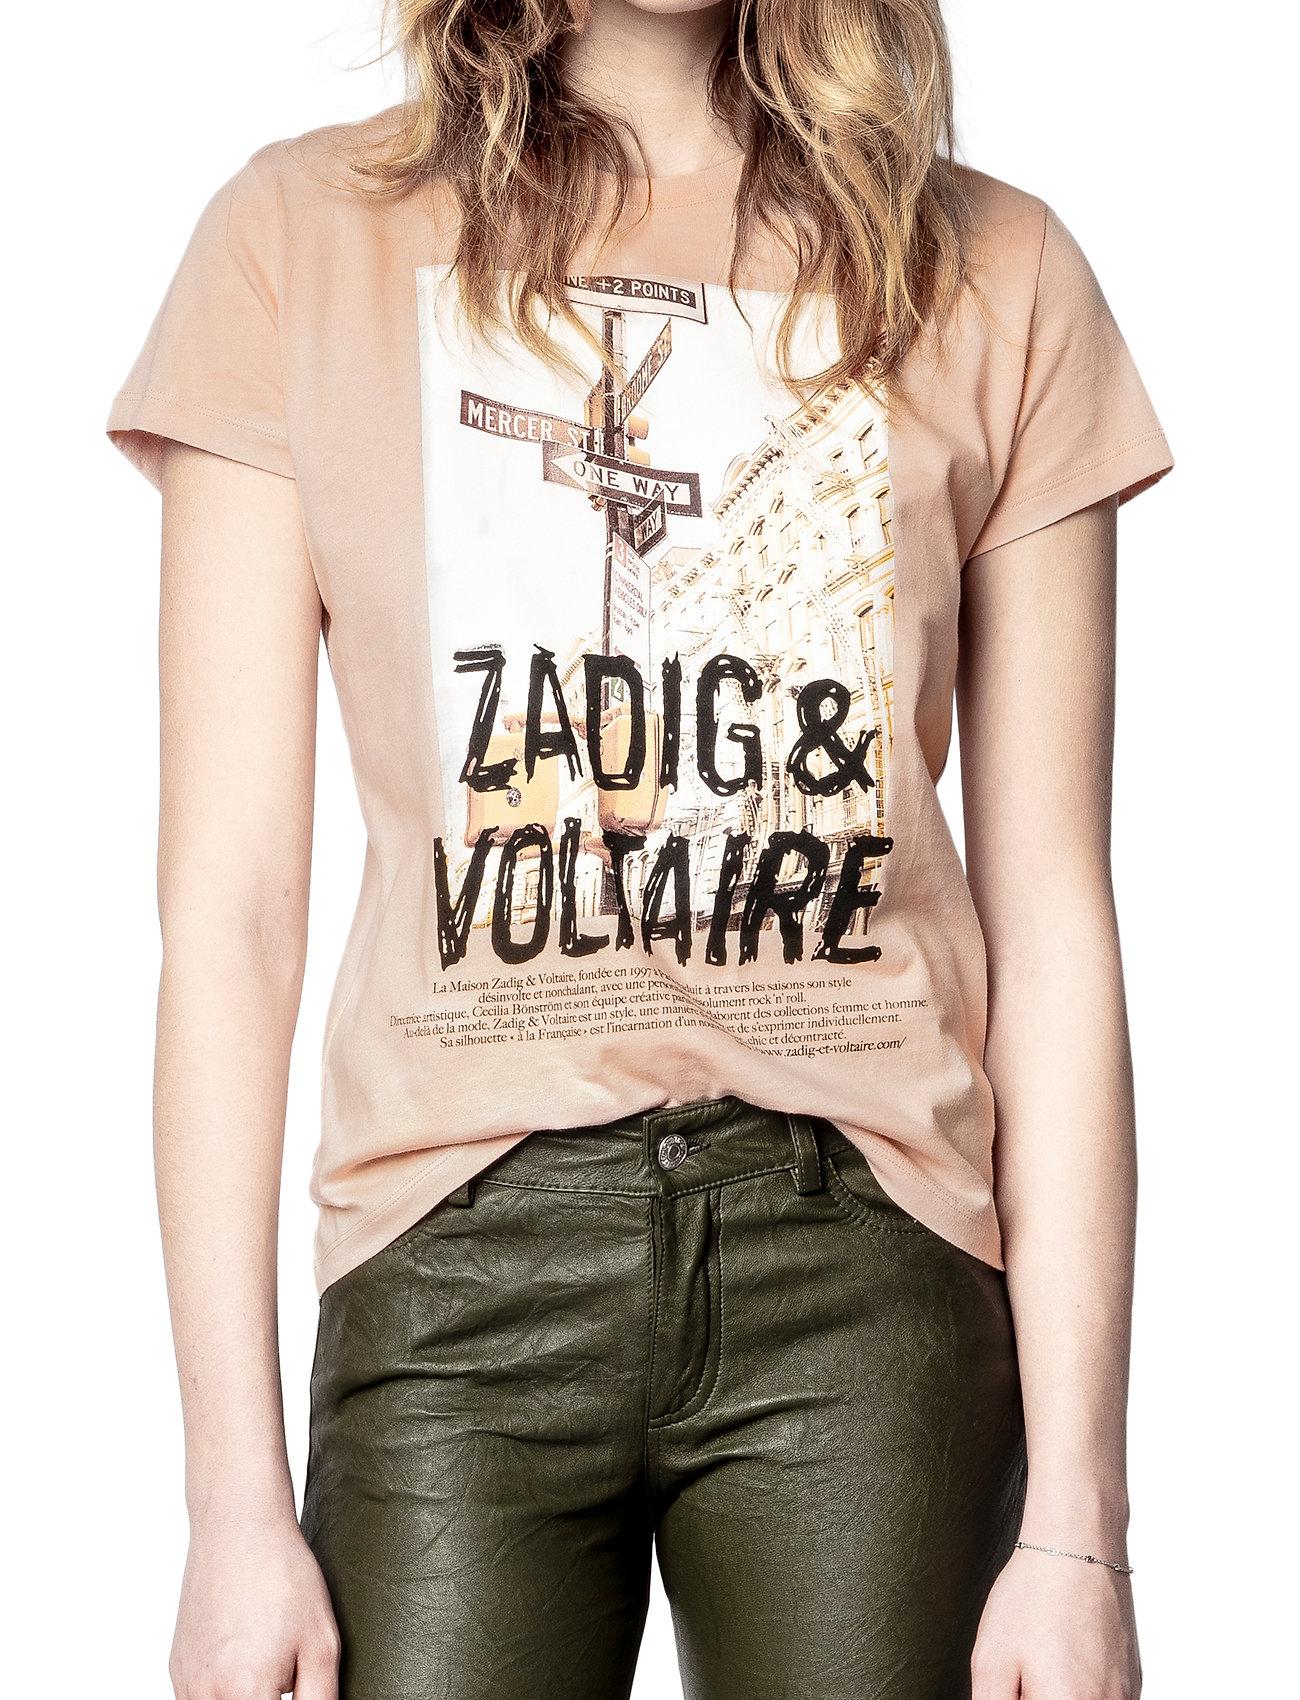 Zadig & Voltaire - ZOE PHOTOPRINT PRINTED T-SHIRT - t-shirts - skin - 0